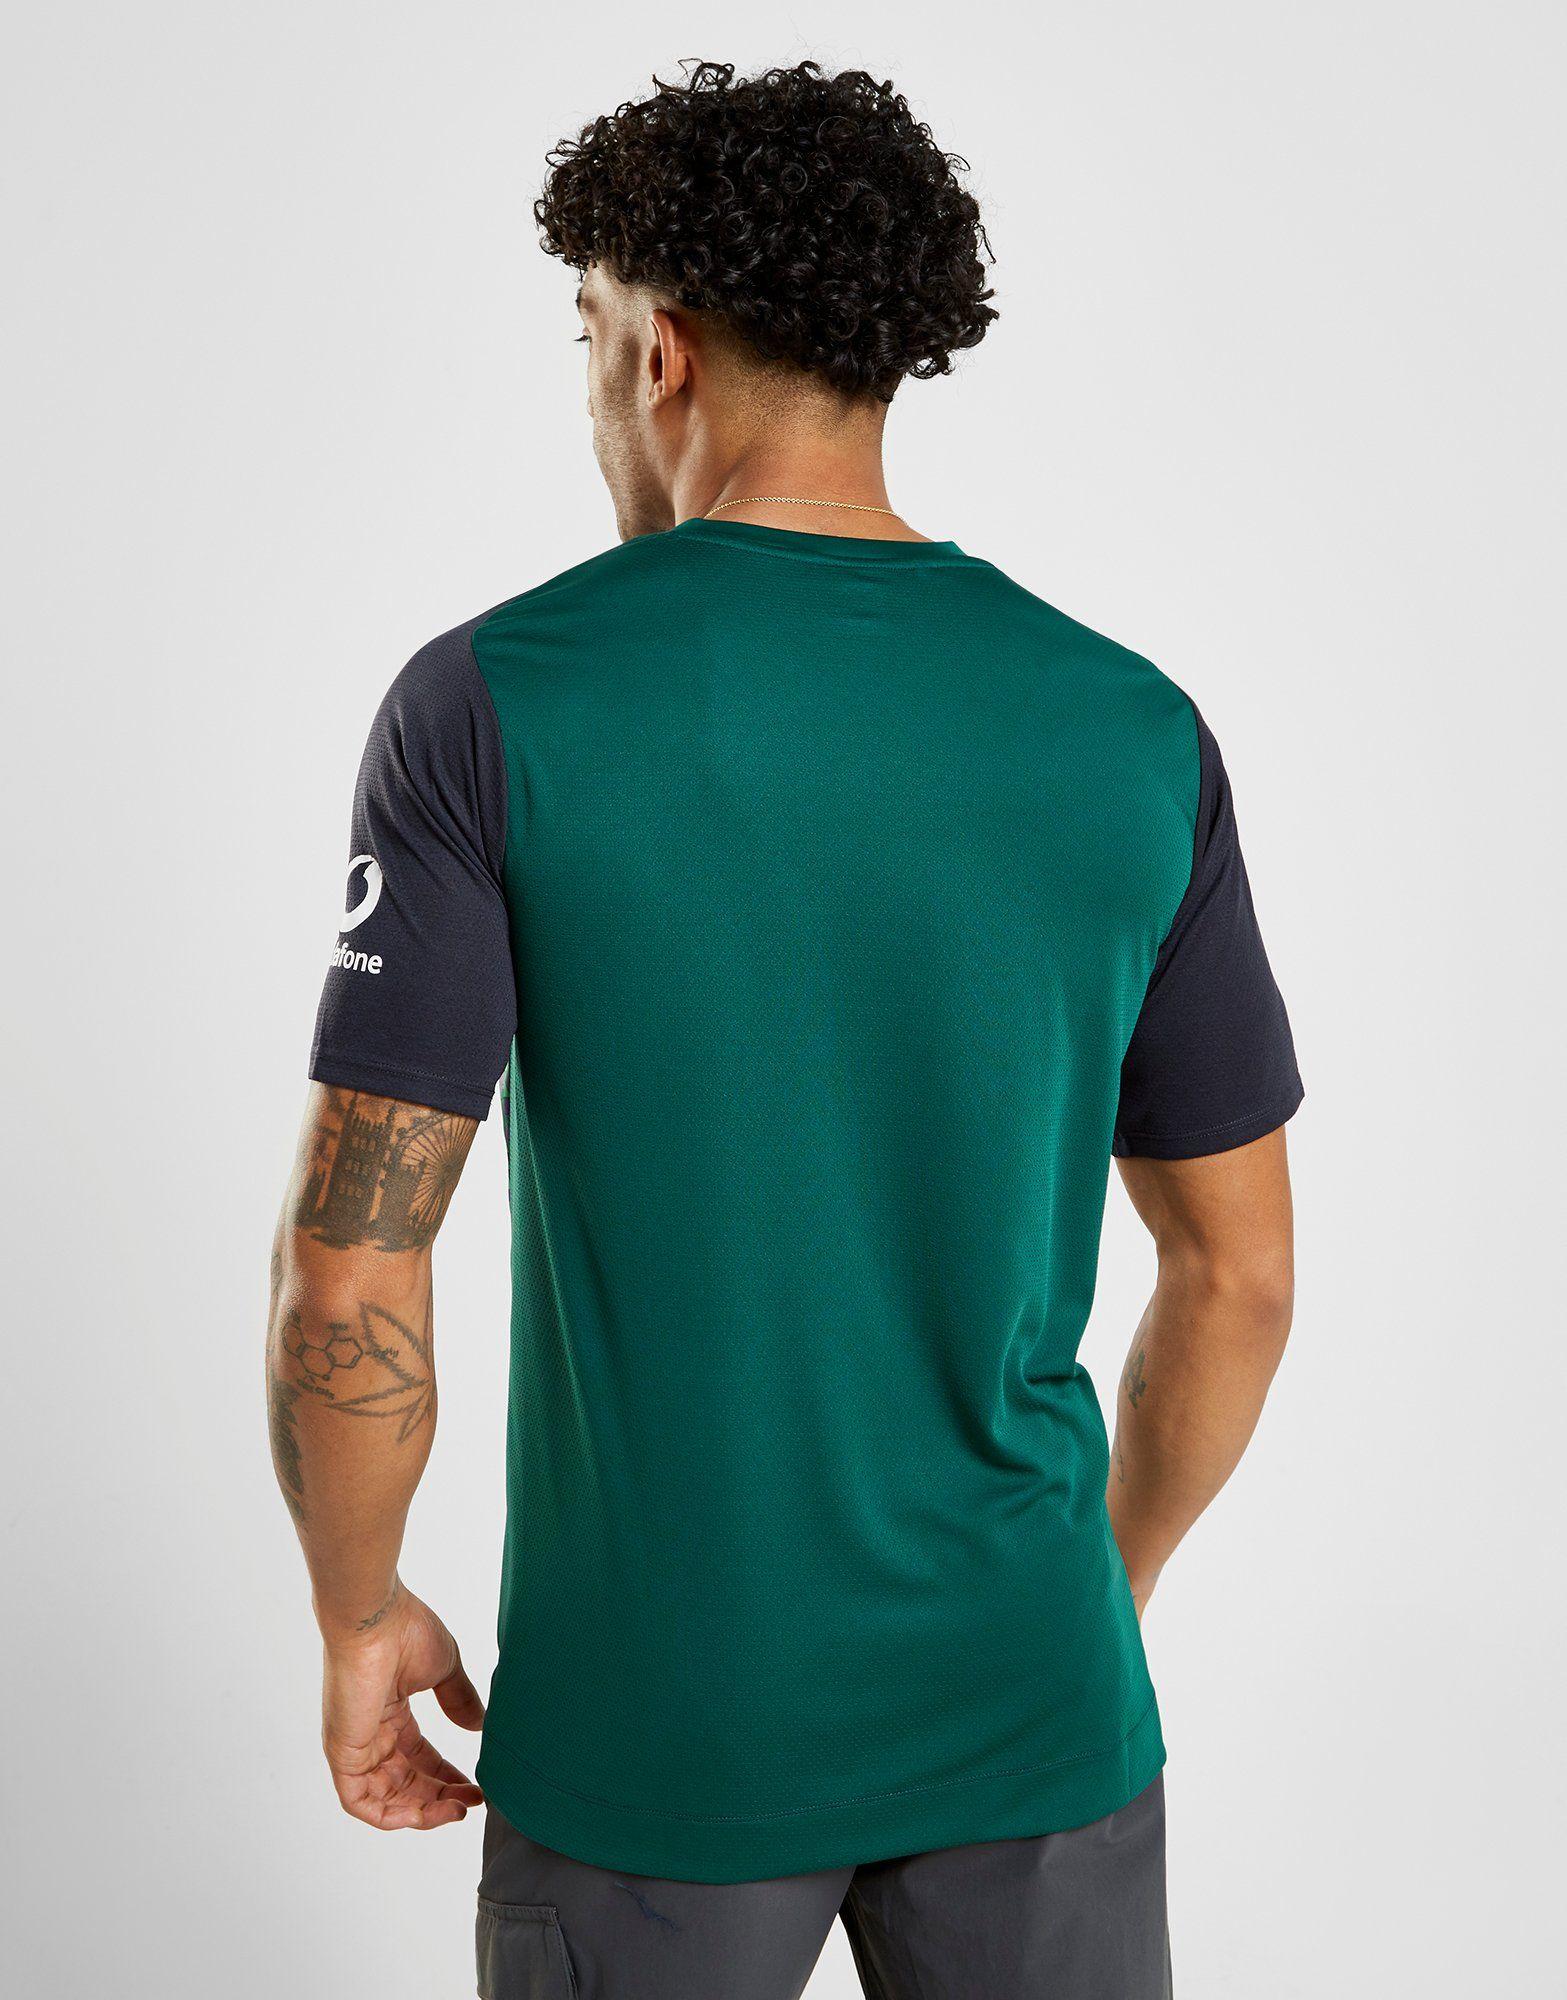 Canterbury Ireland RFU VapoDri Short Sleeve T-Shirt